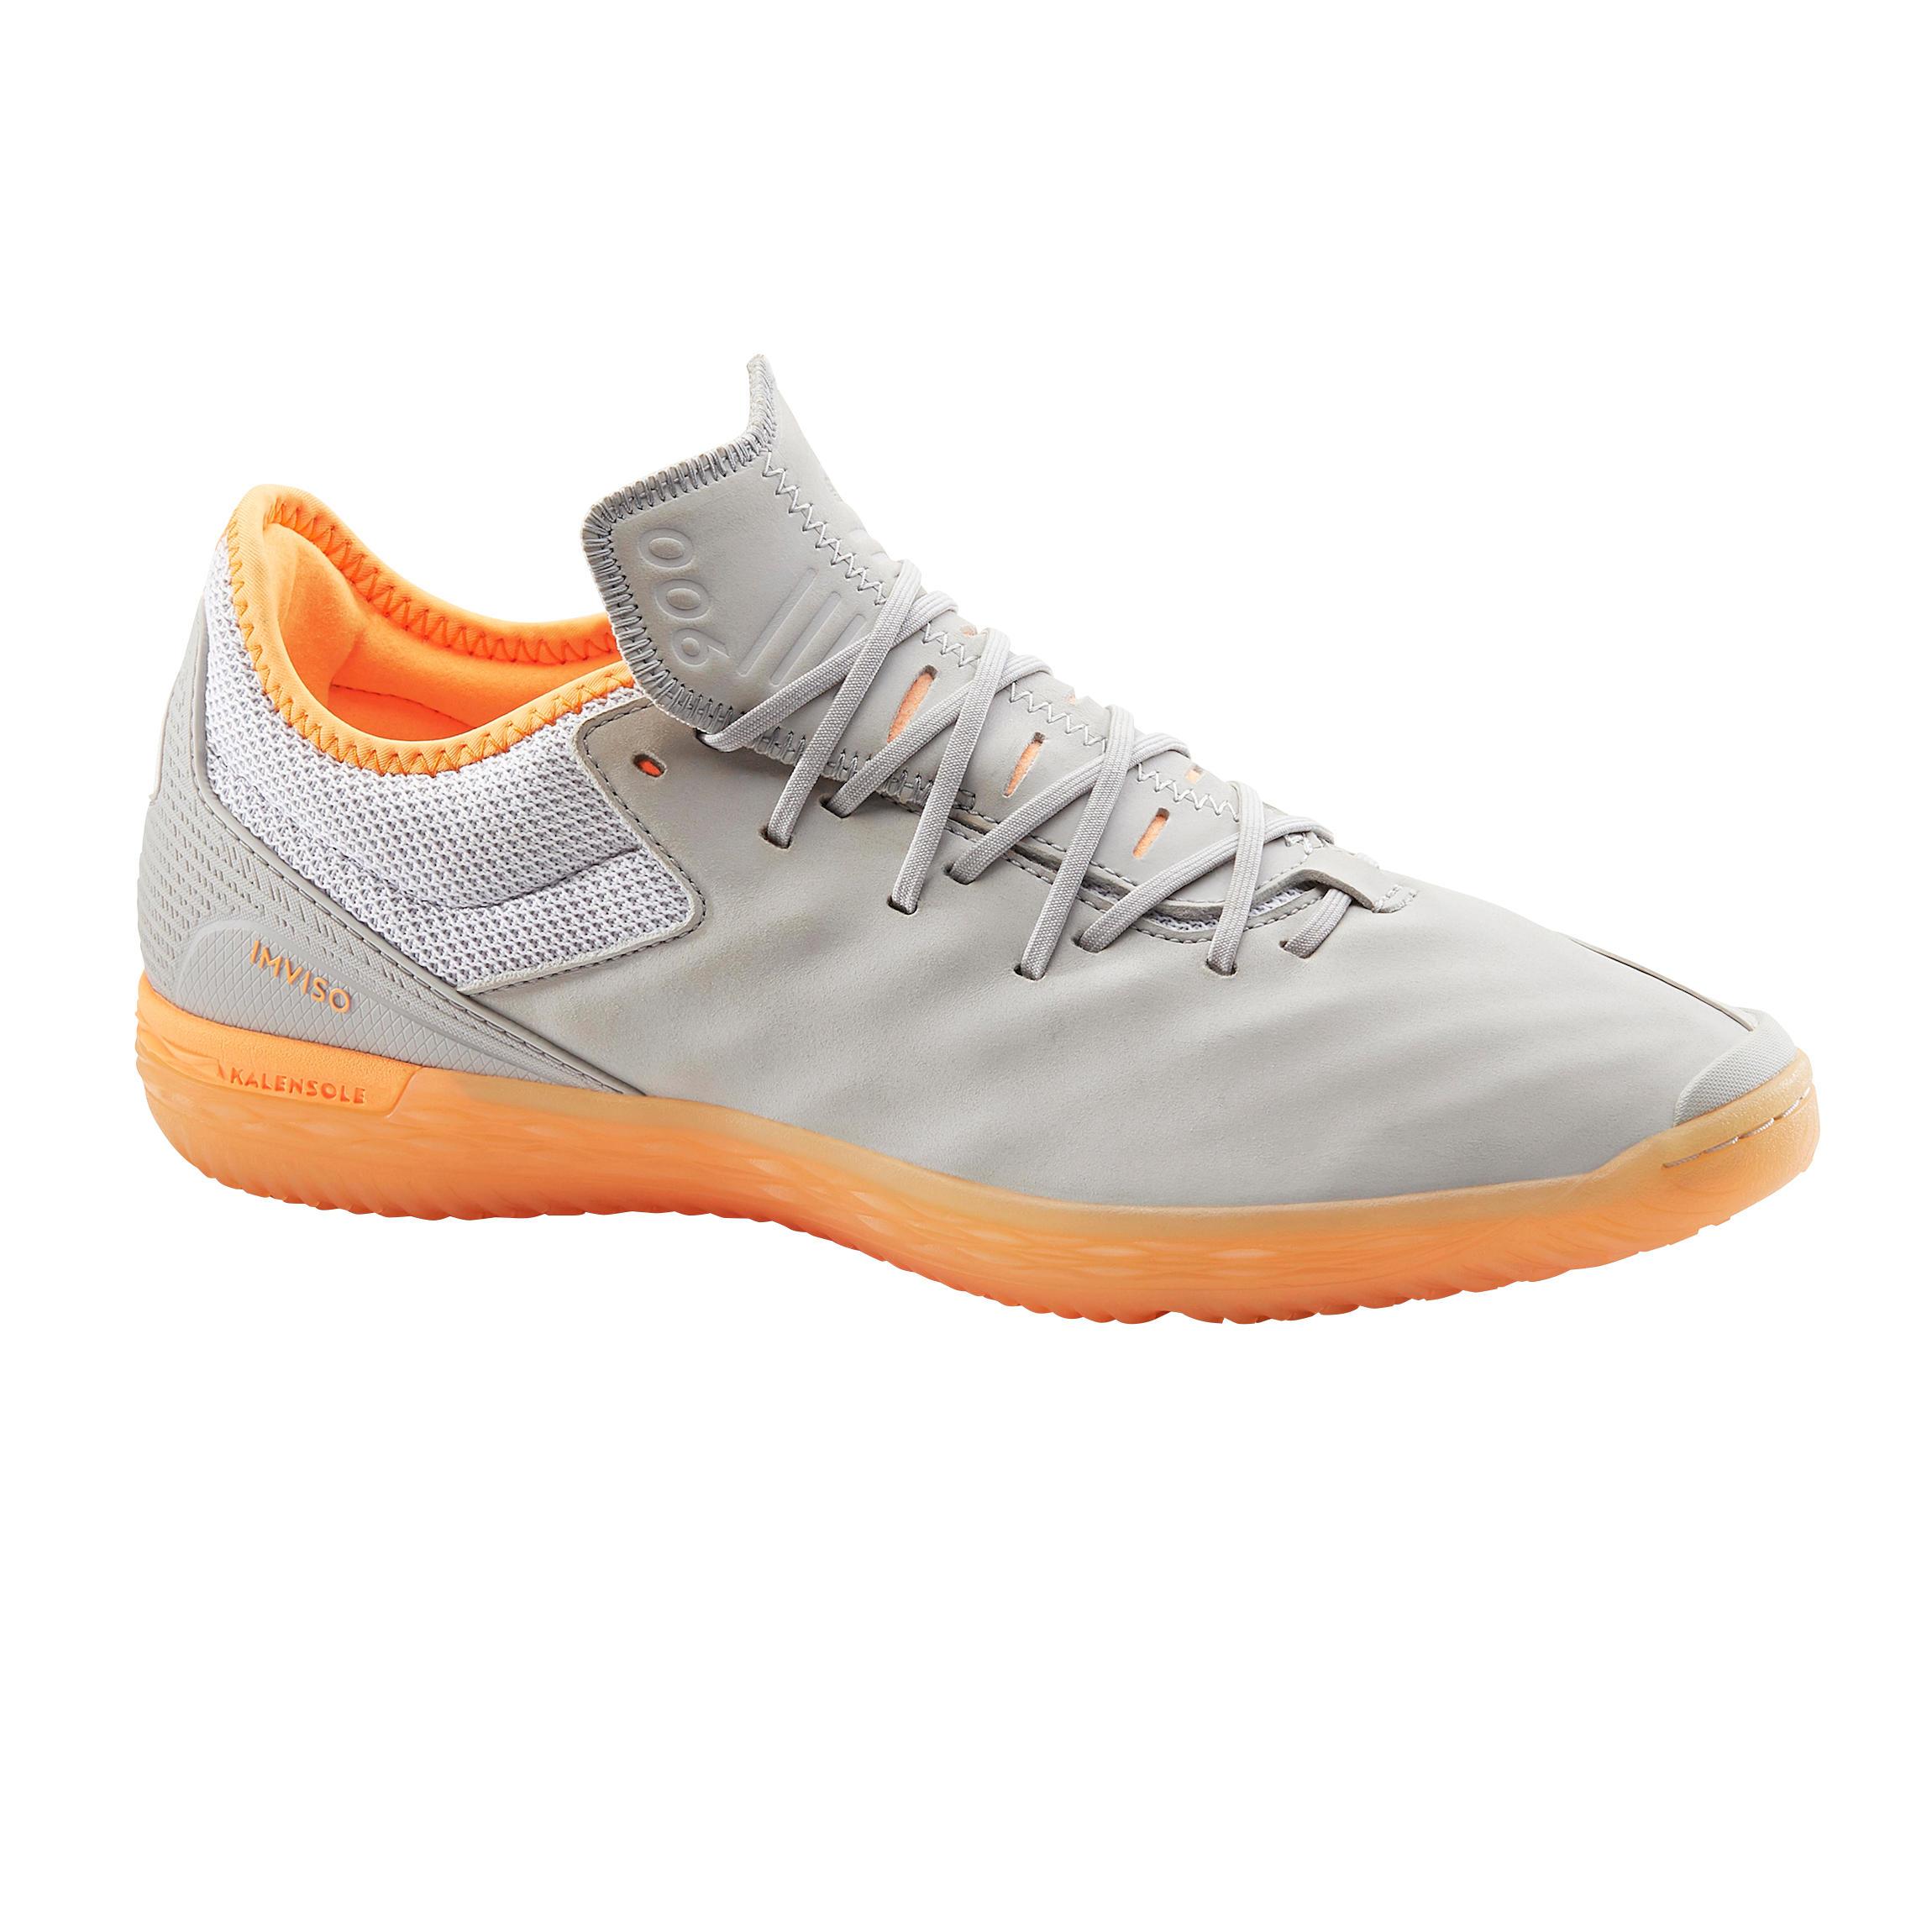 Chaussures Futsal Femme | Decathlon